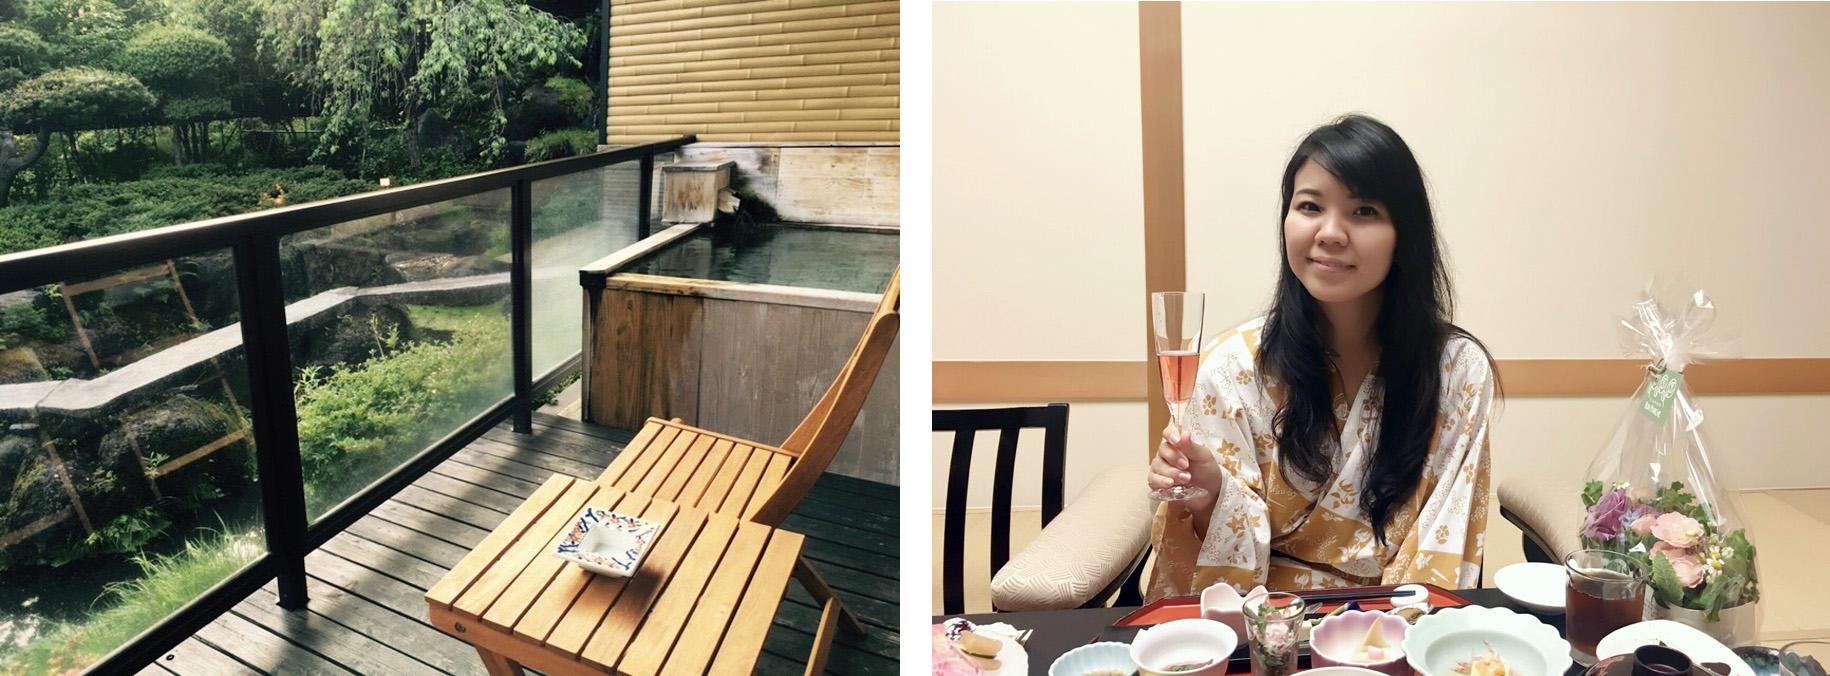 Happy Birthday Anzu in 日光_c0000759_15453160.jpg